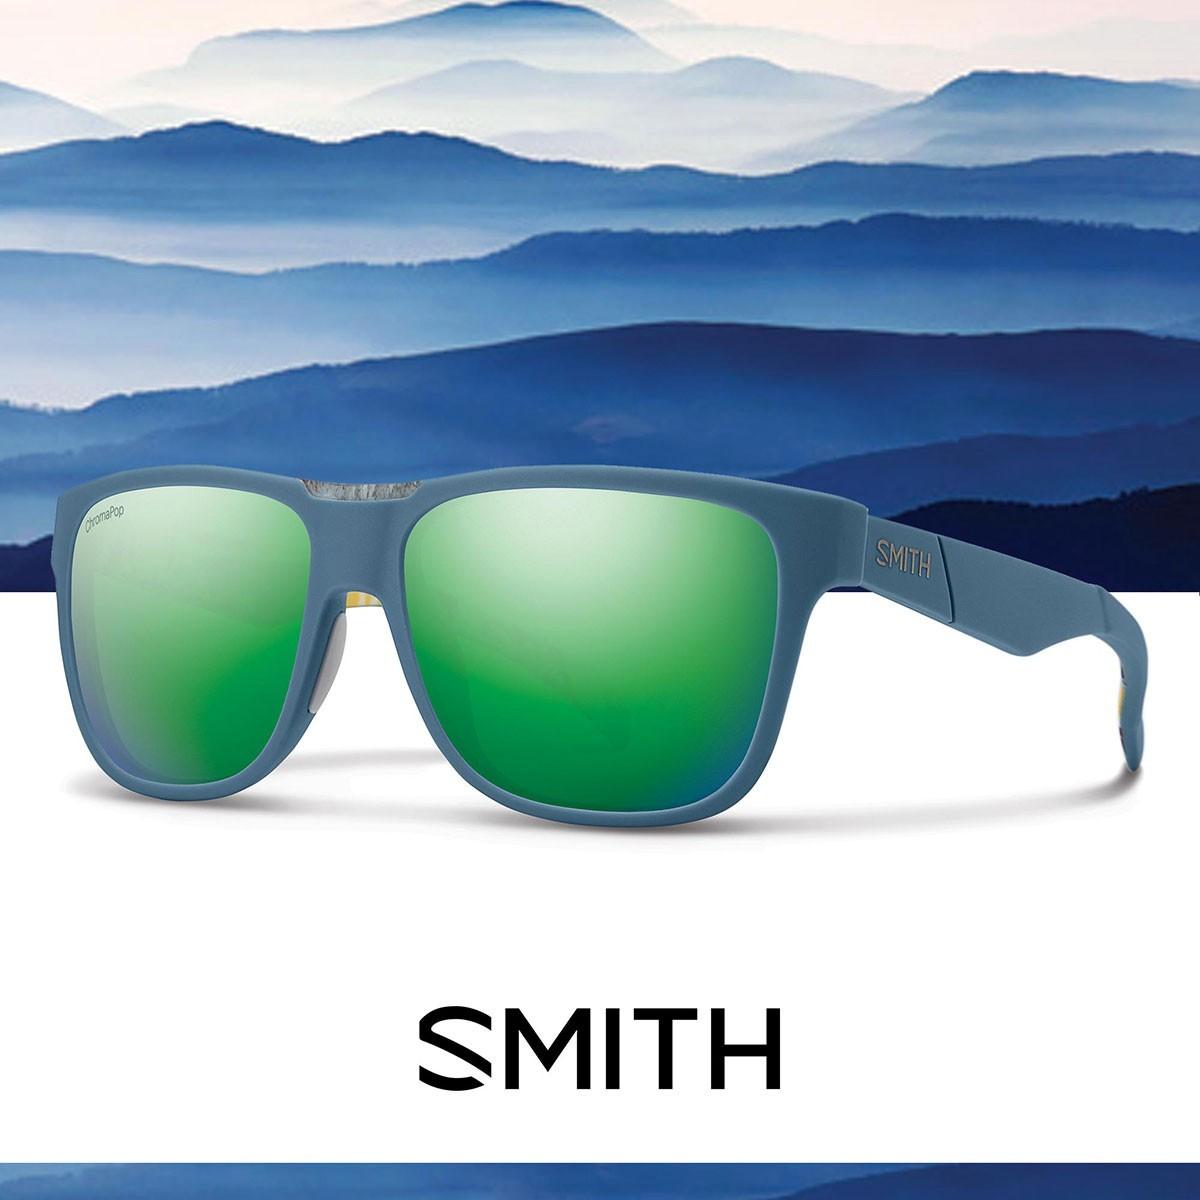 SMITH LOWDOWN Matte Corsair Ripped CHROMAPOP - Изображение - AQUAMATRIX